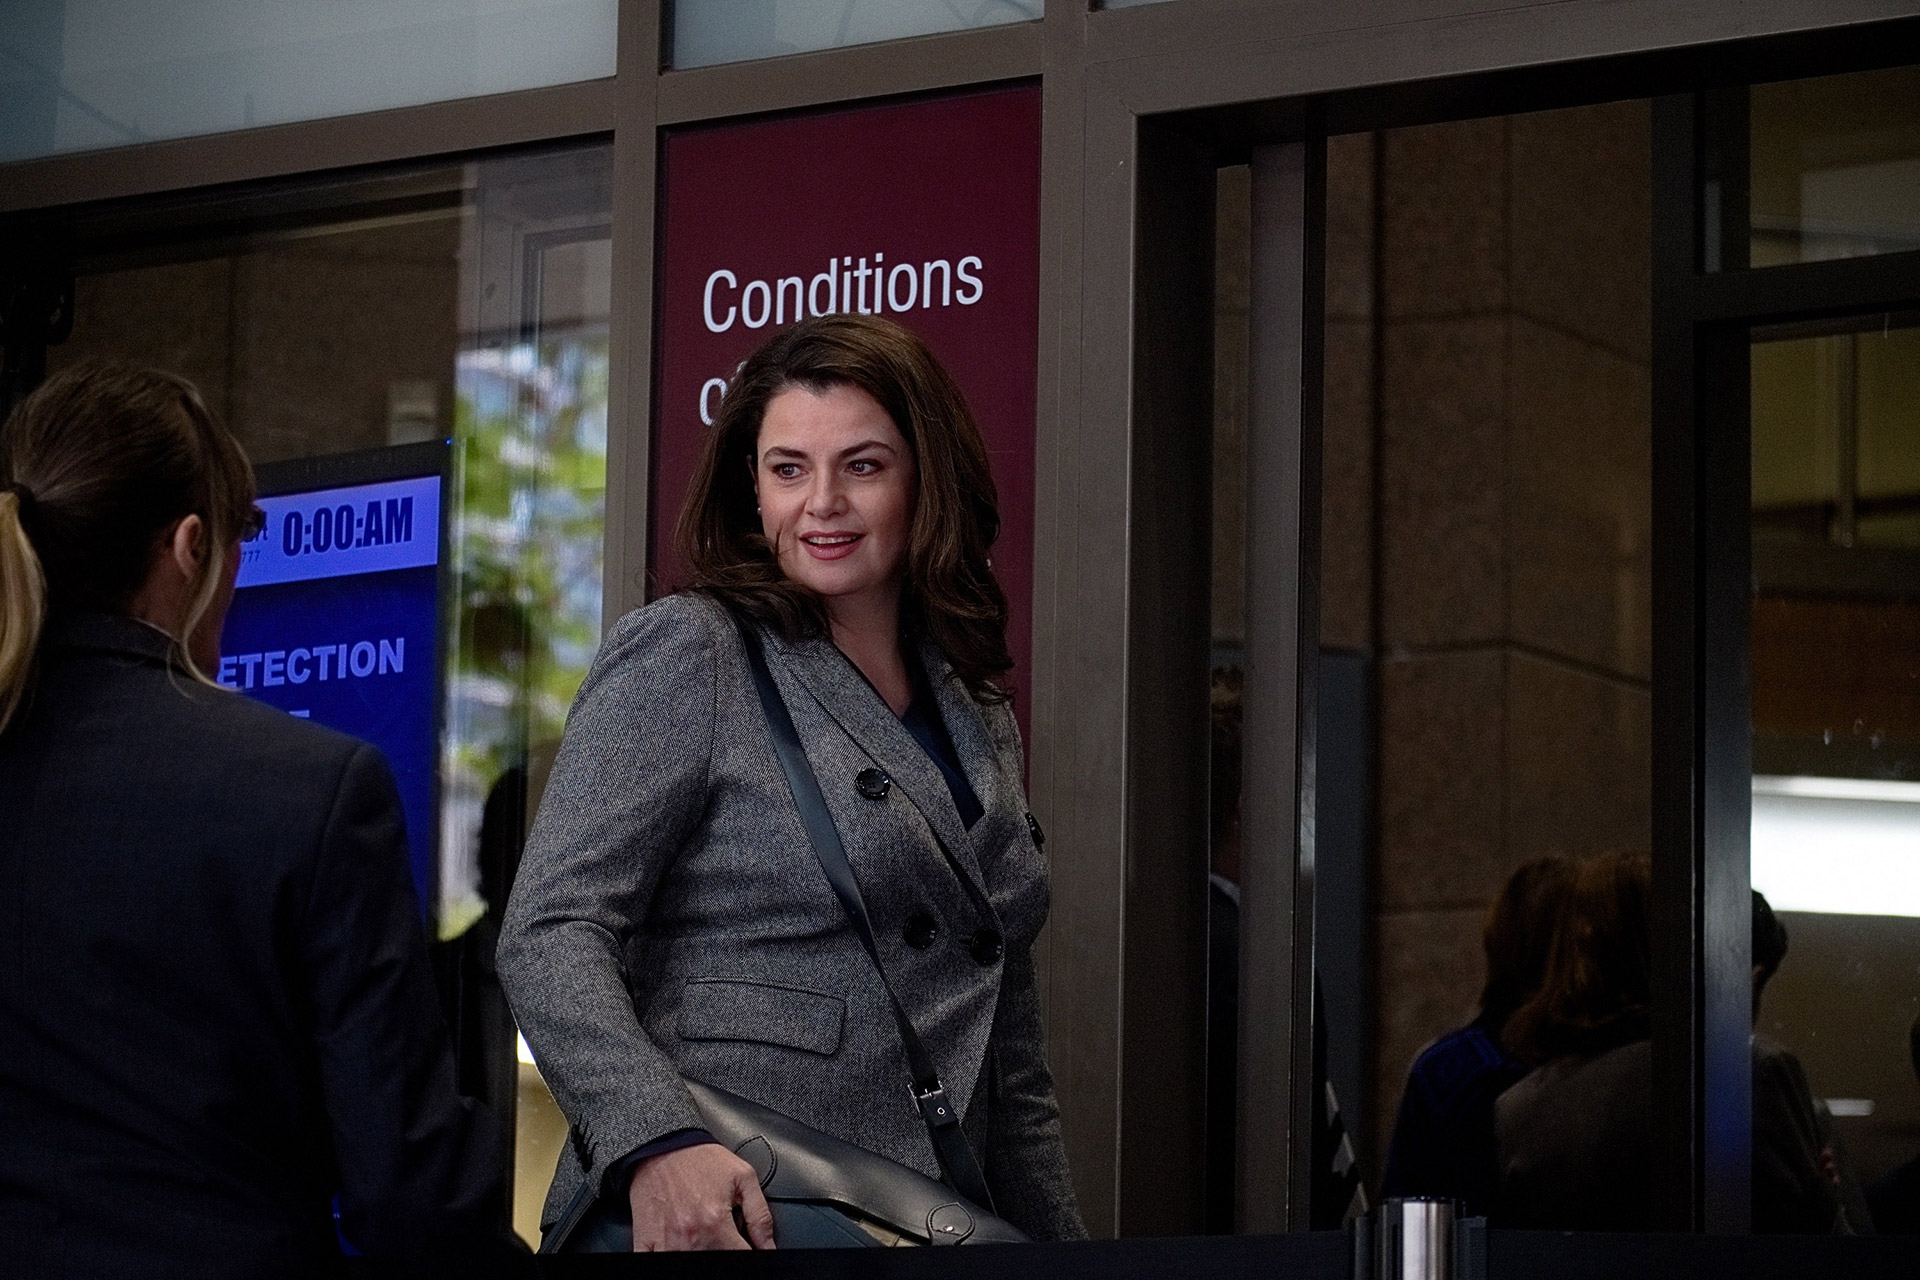 Defamation suit / higher fine for ABC journalist in Villamedia